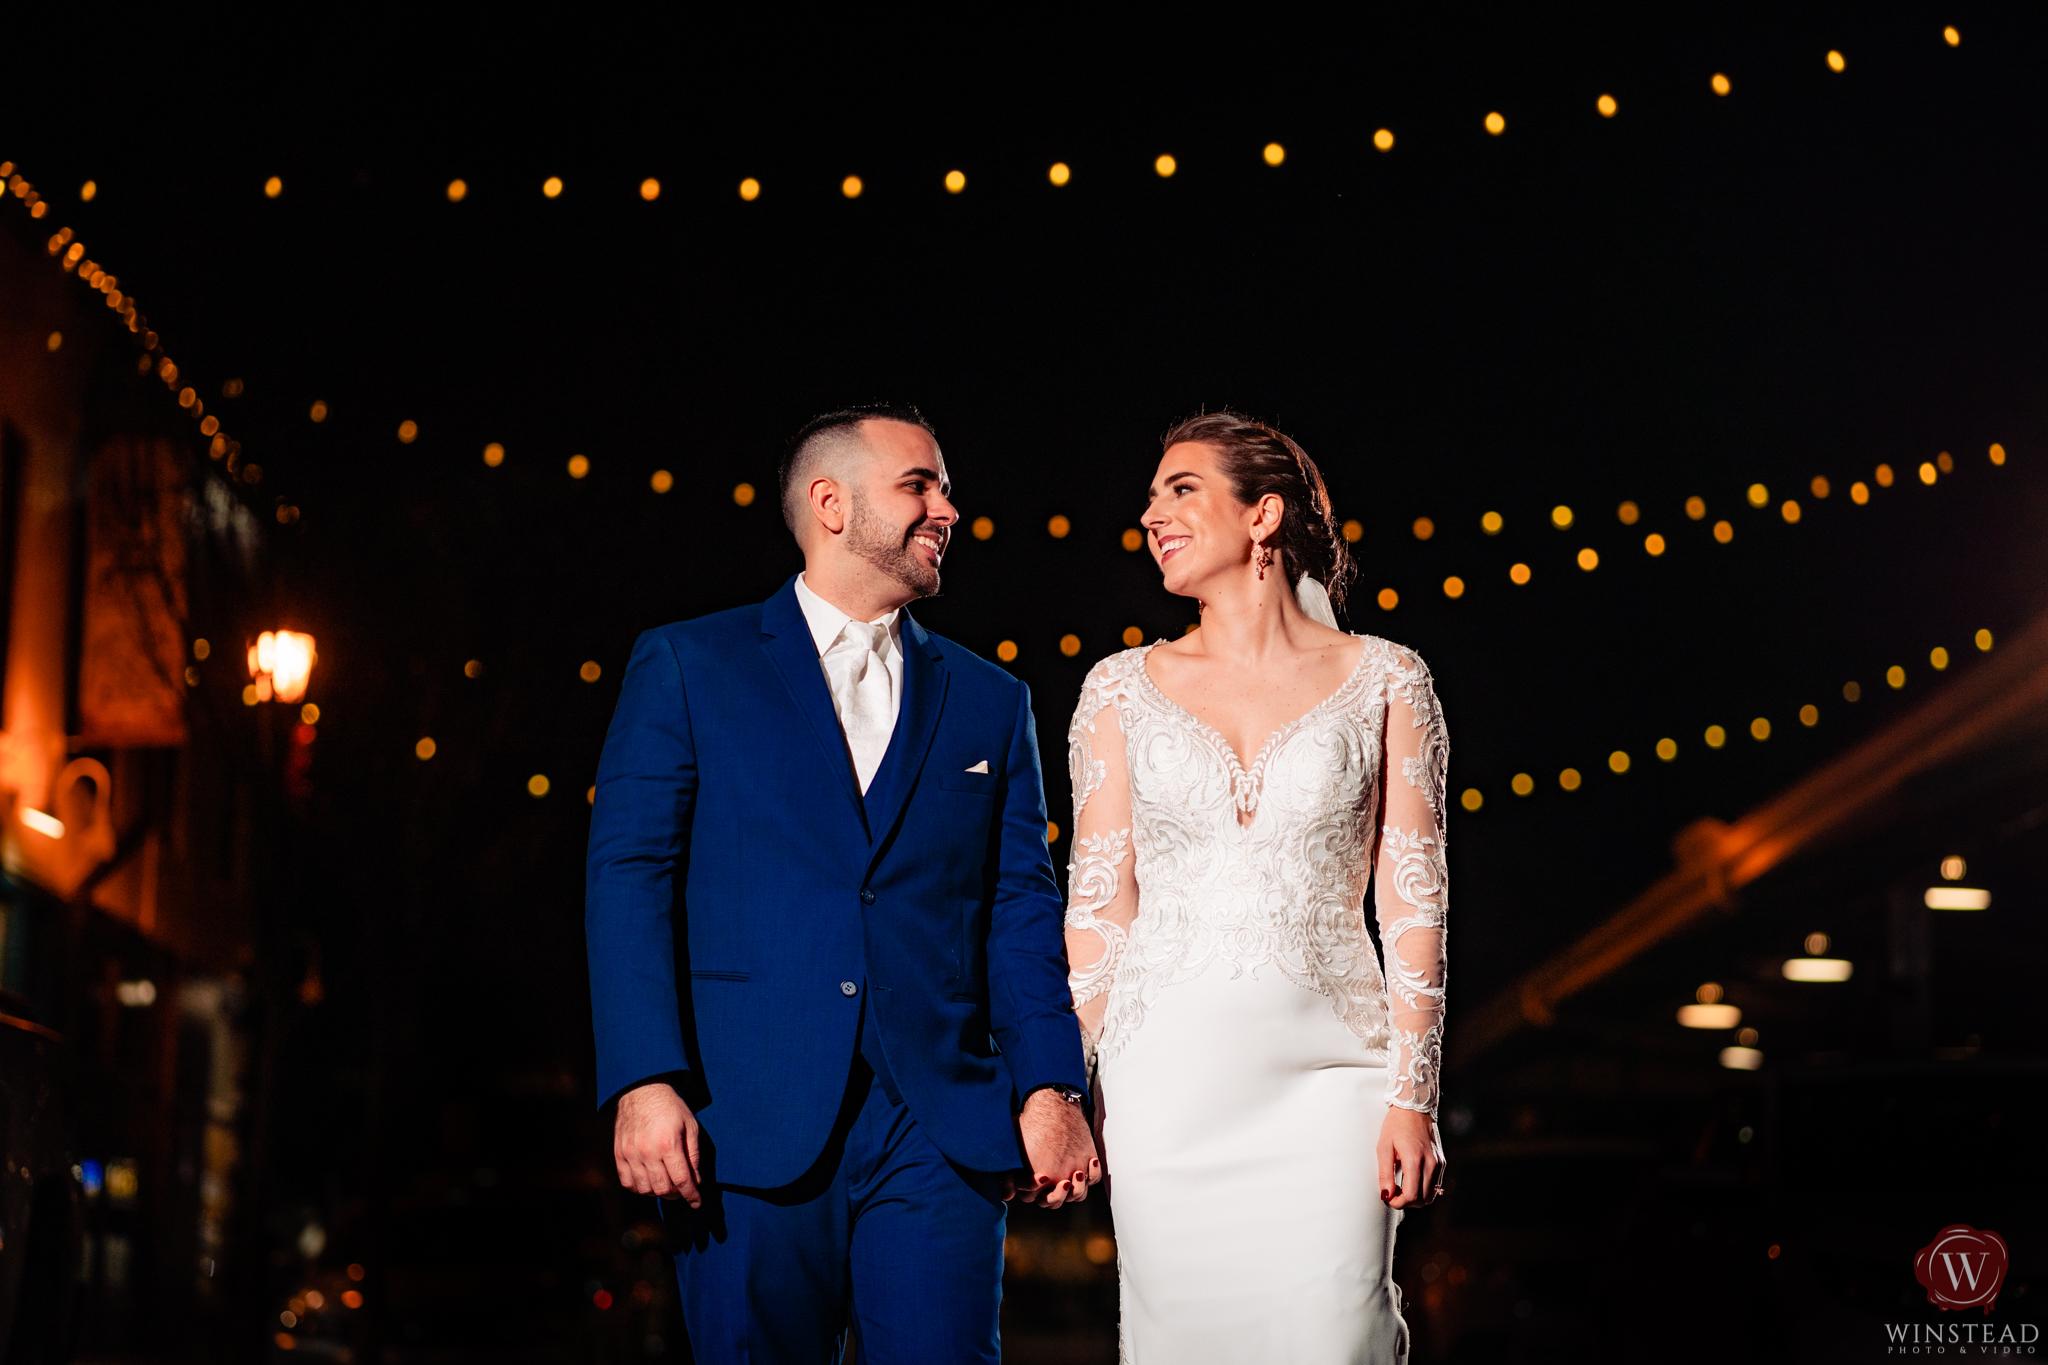 Morgan&Danny-Raleigh-Wedding-Market-Hall-5366-4.jpg